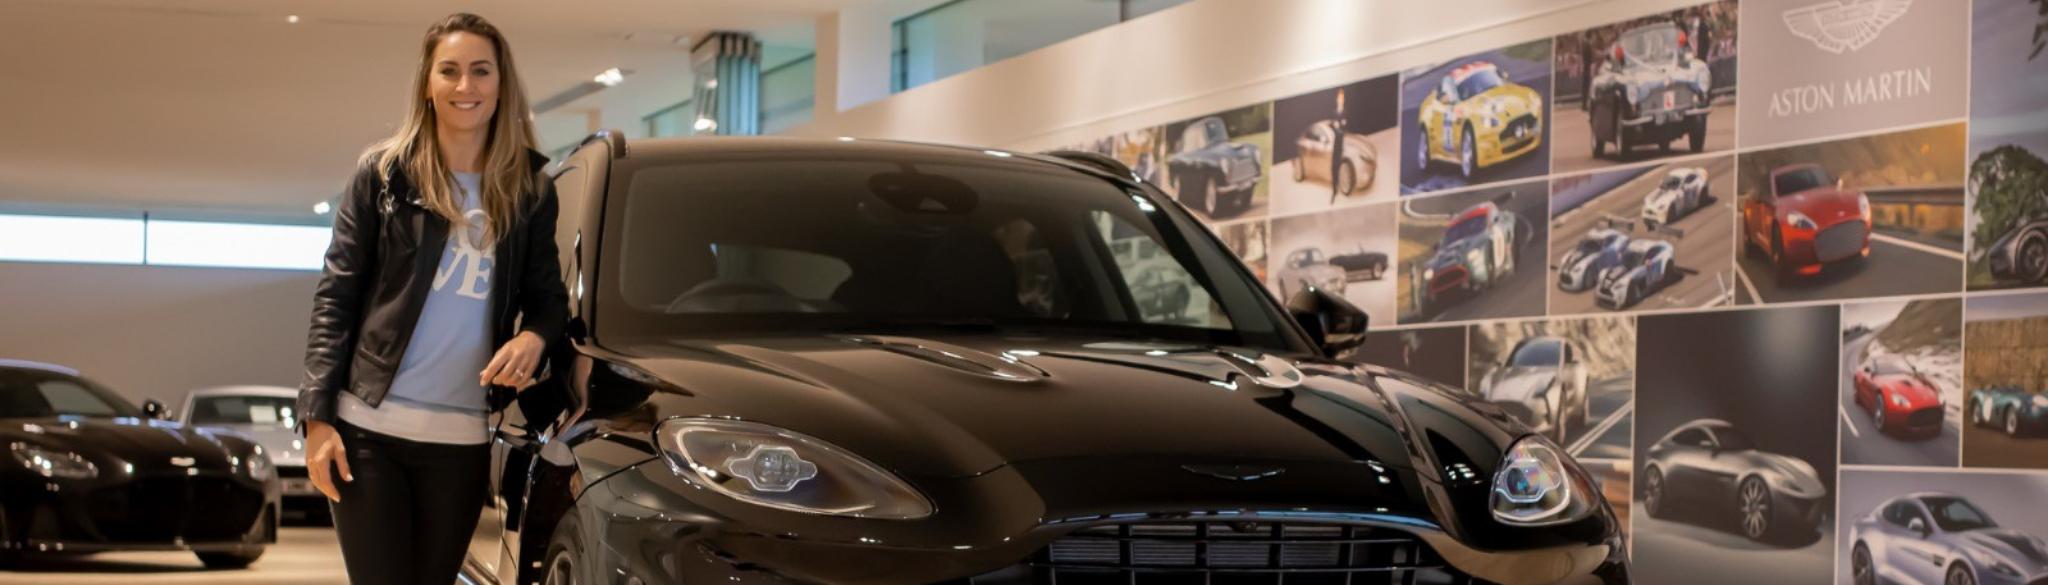 Aston Martin DBX Amy Williams MBE